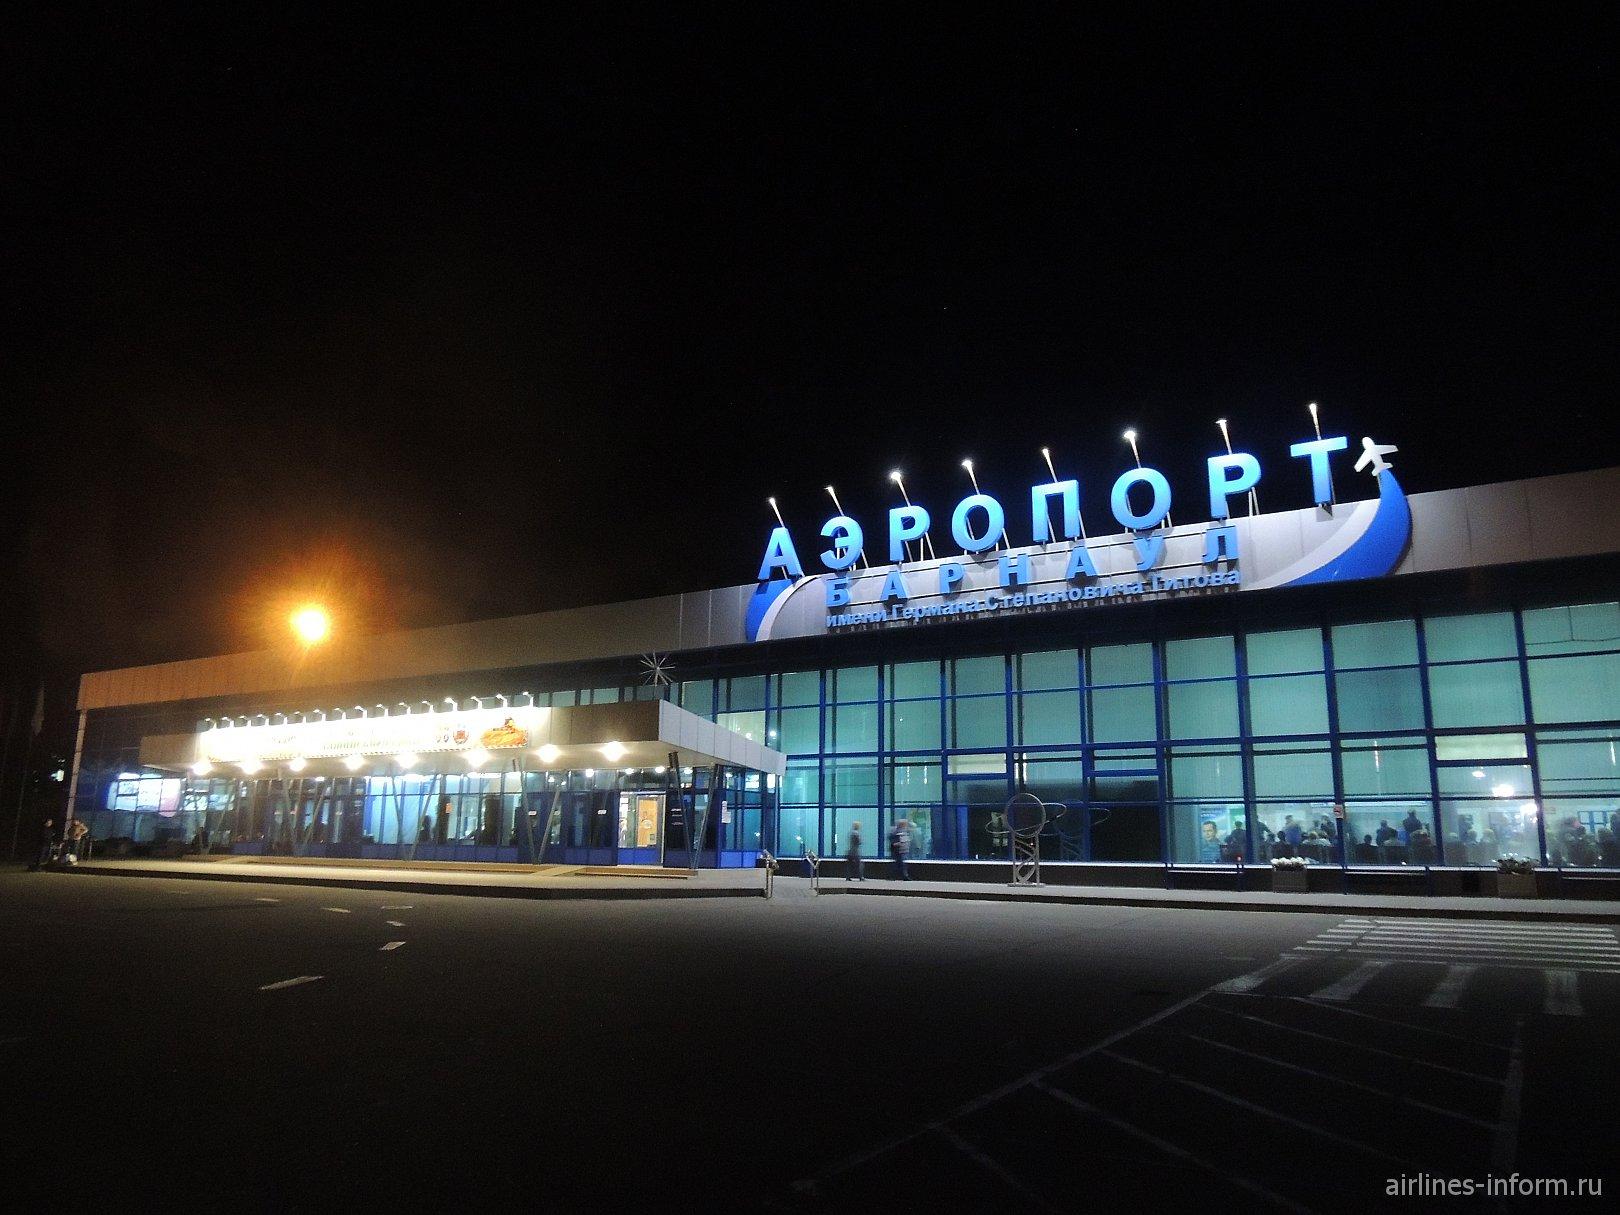 Аэровокзал аэропорта Барнаул имени Германа Степановича Титова